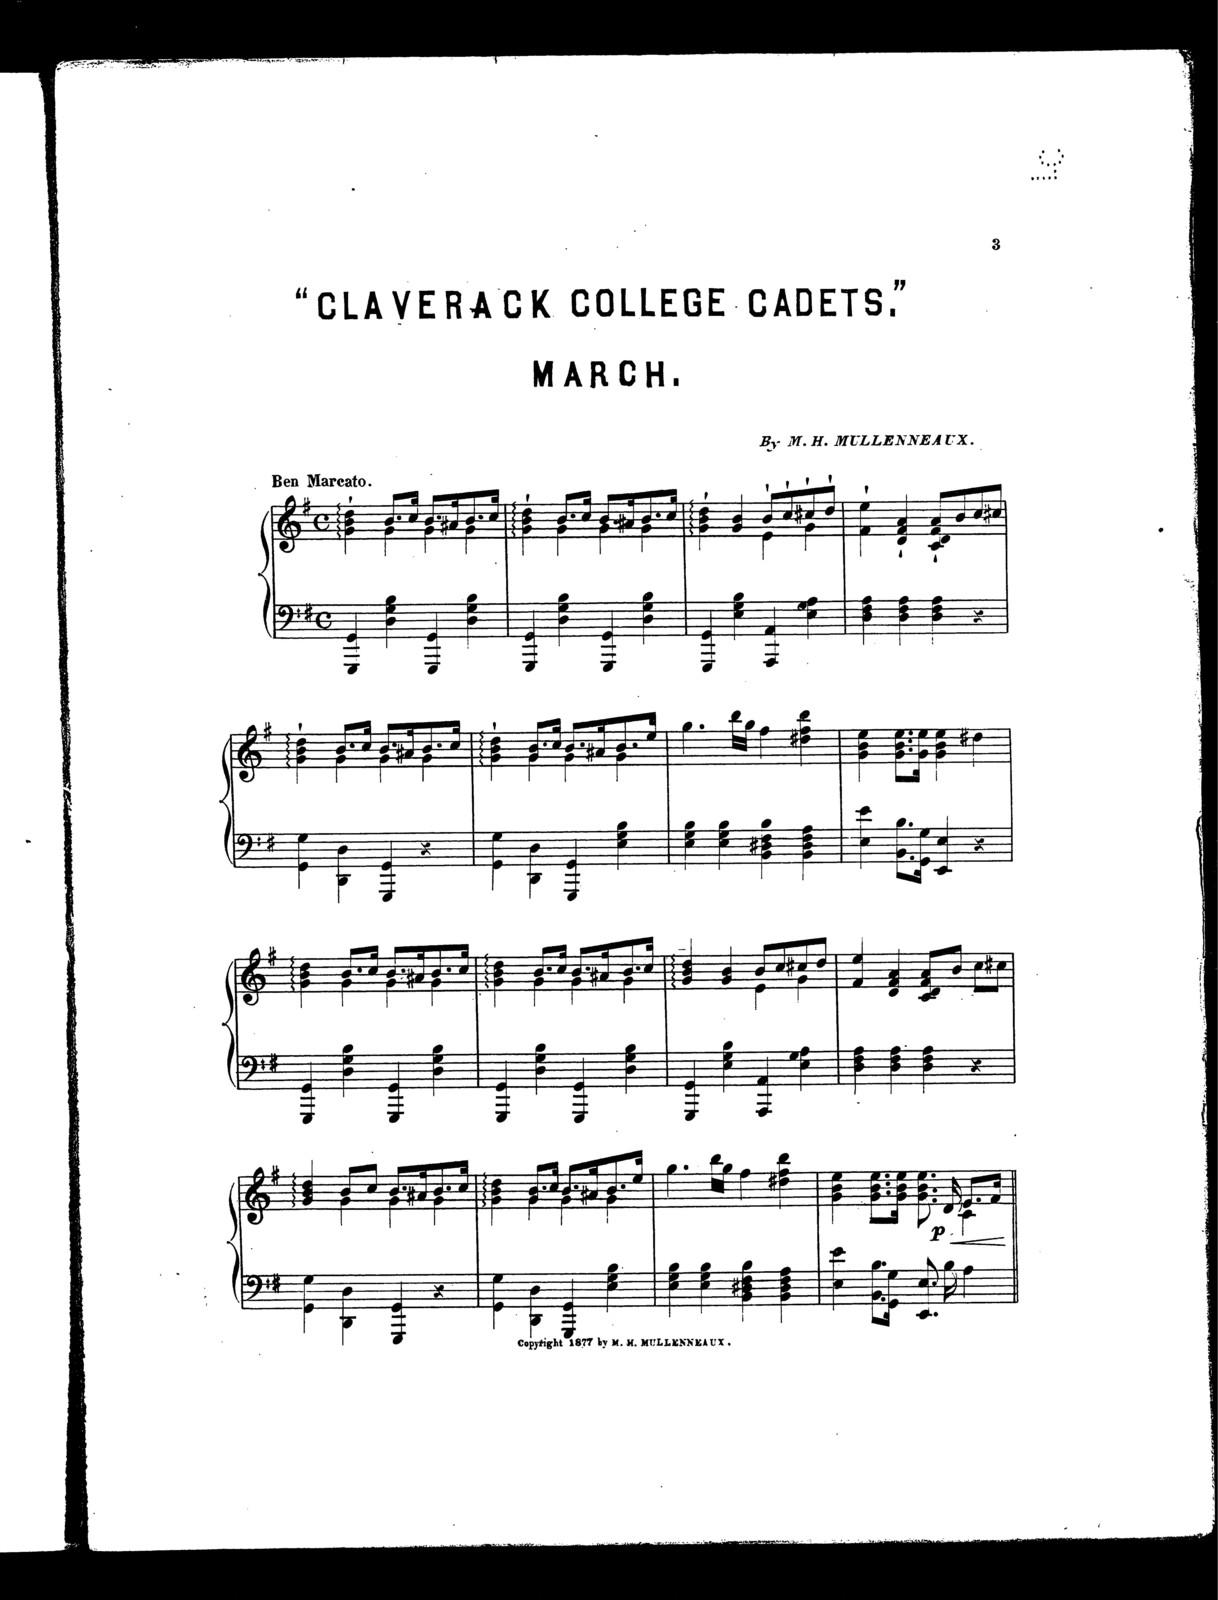 Claverack college cadets